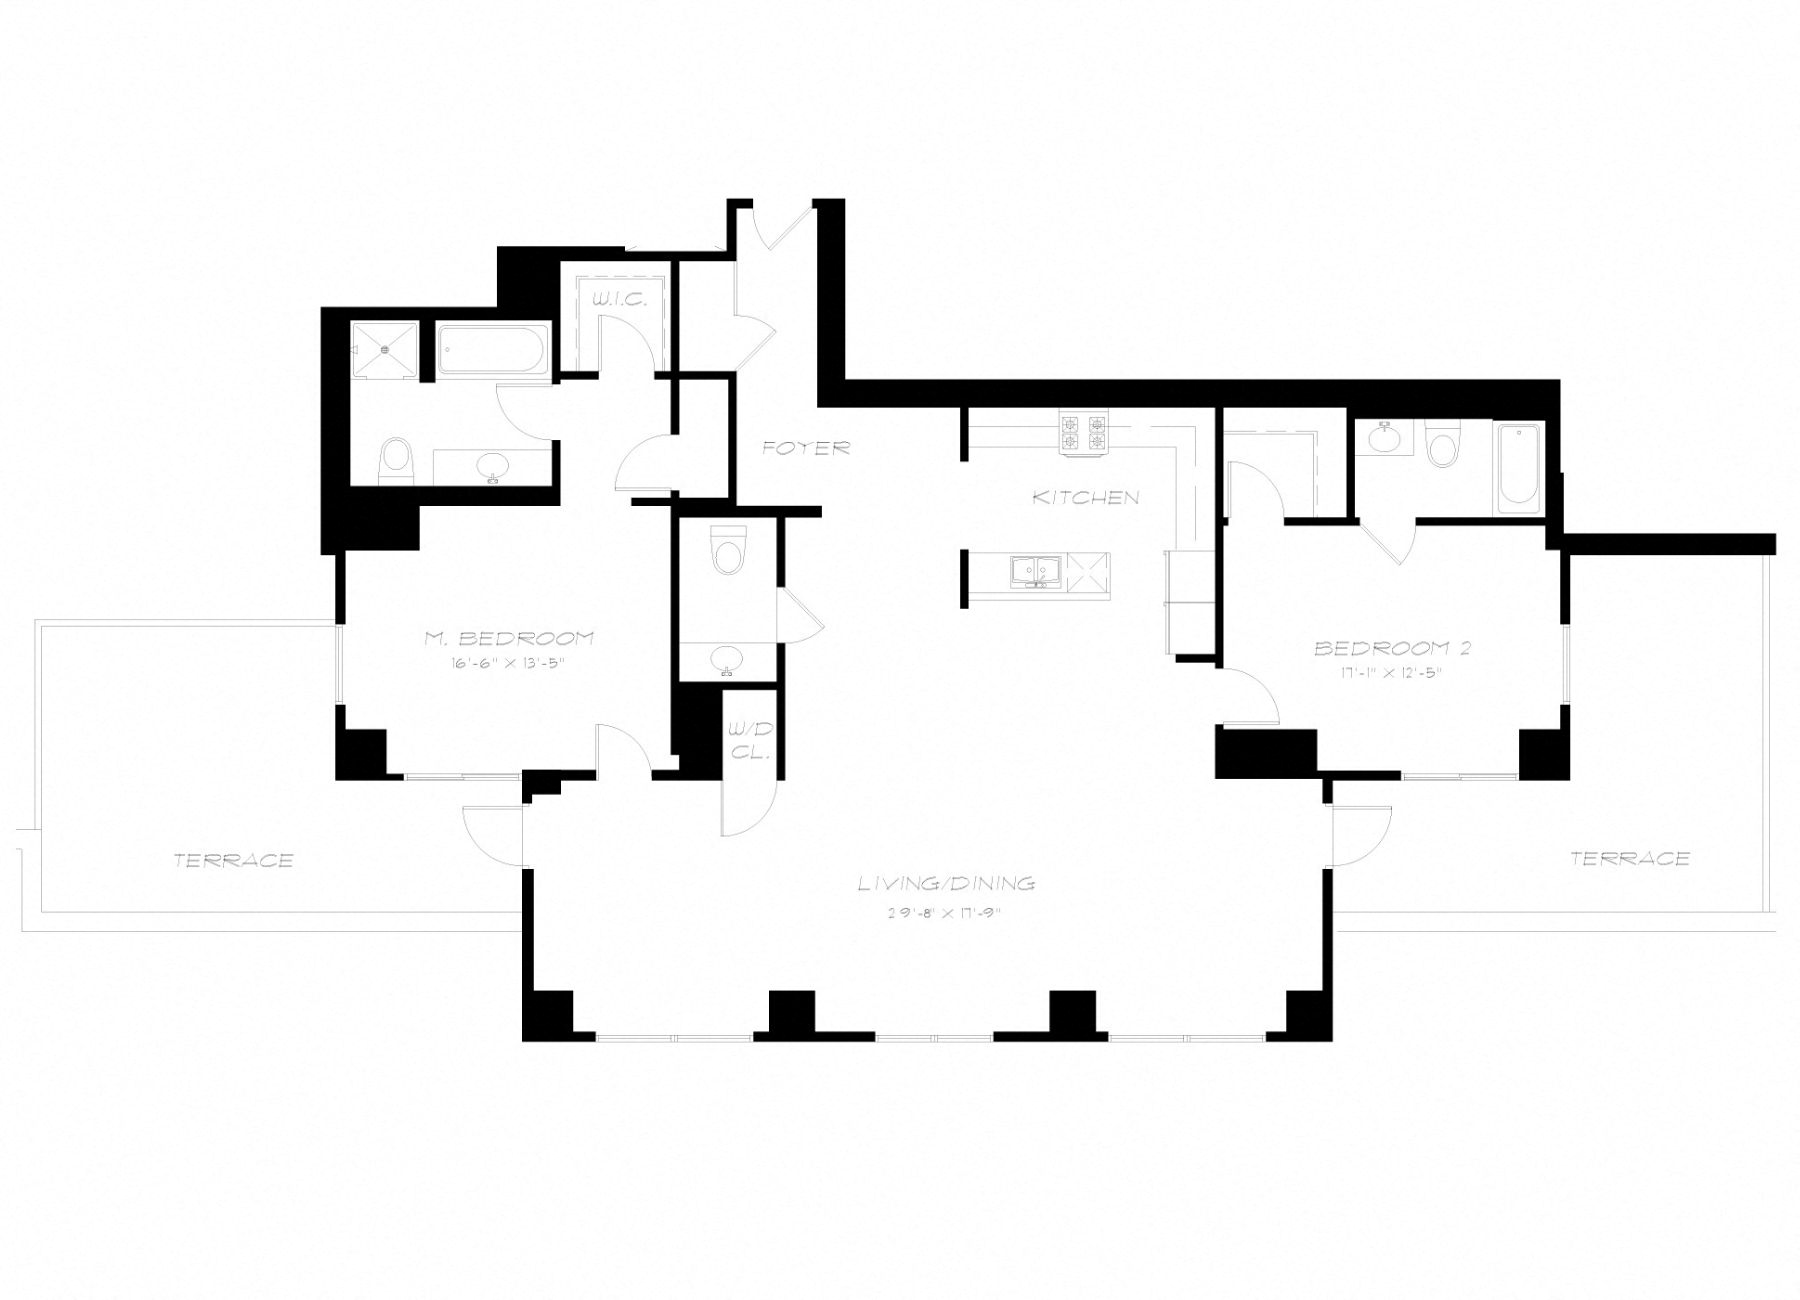 Floorplan PH - 3002